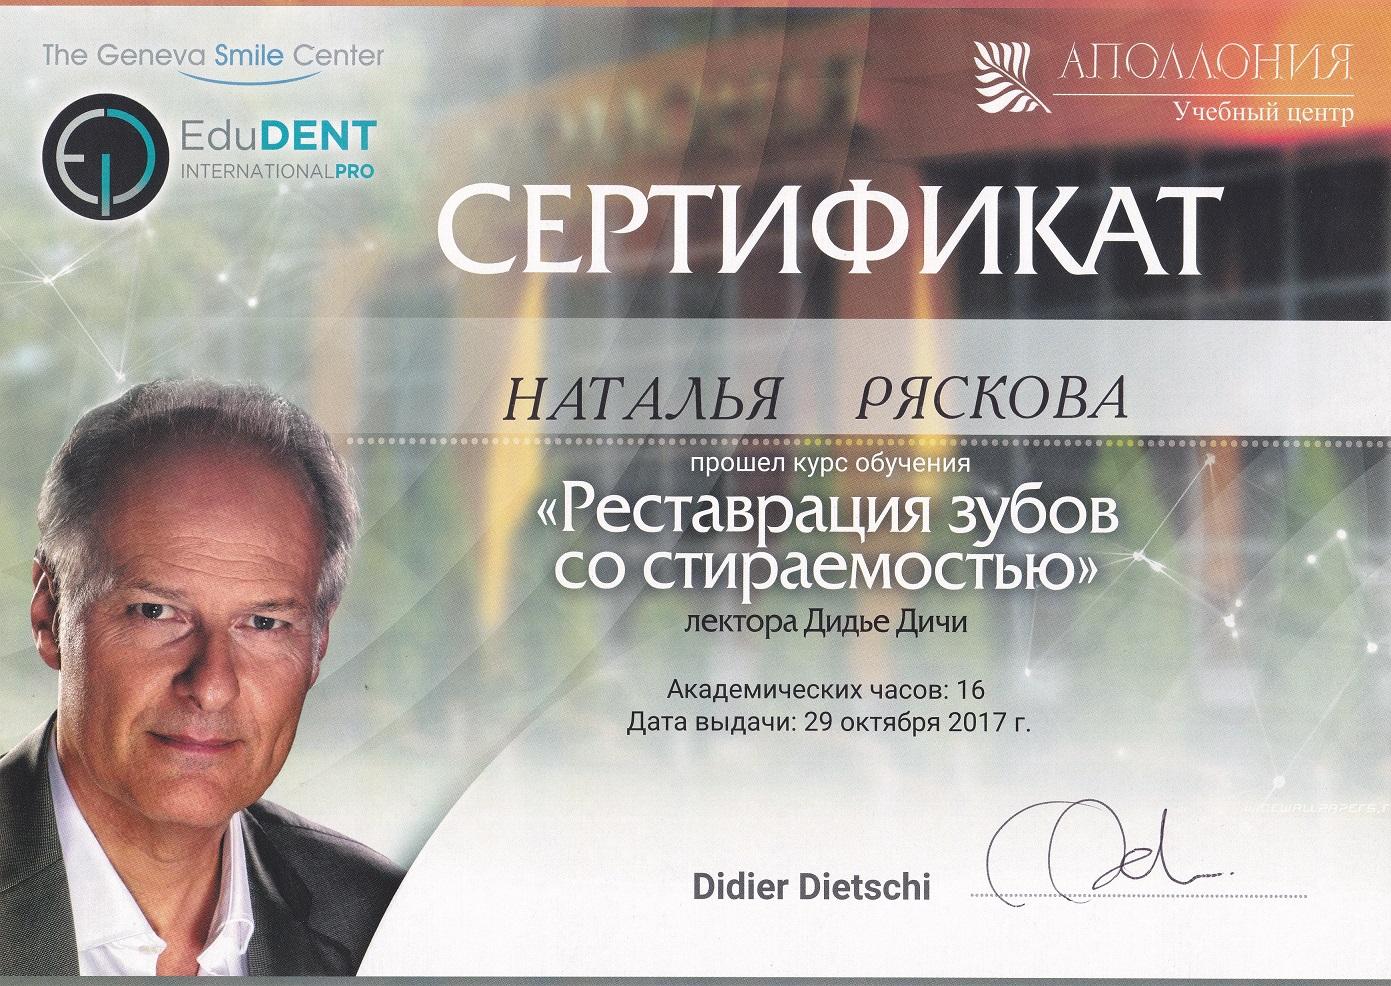 http://oris-vidnoe.ru/wp-content/uploads/2021/05/ryaskova3.jpg